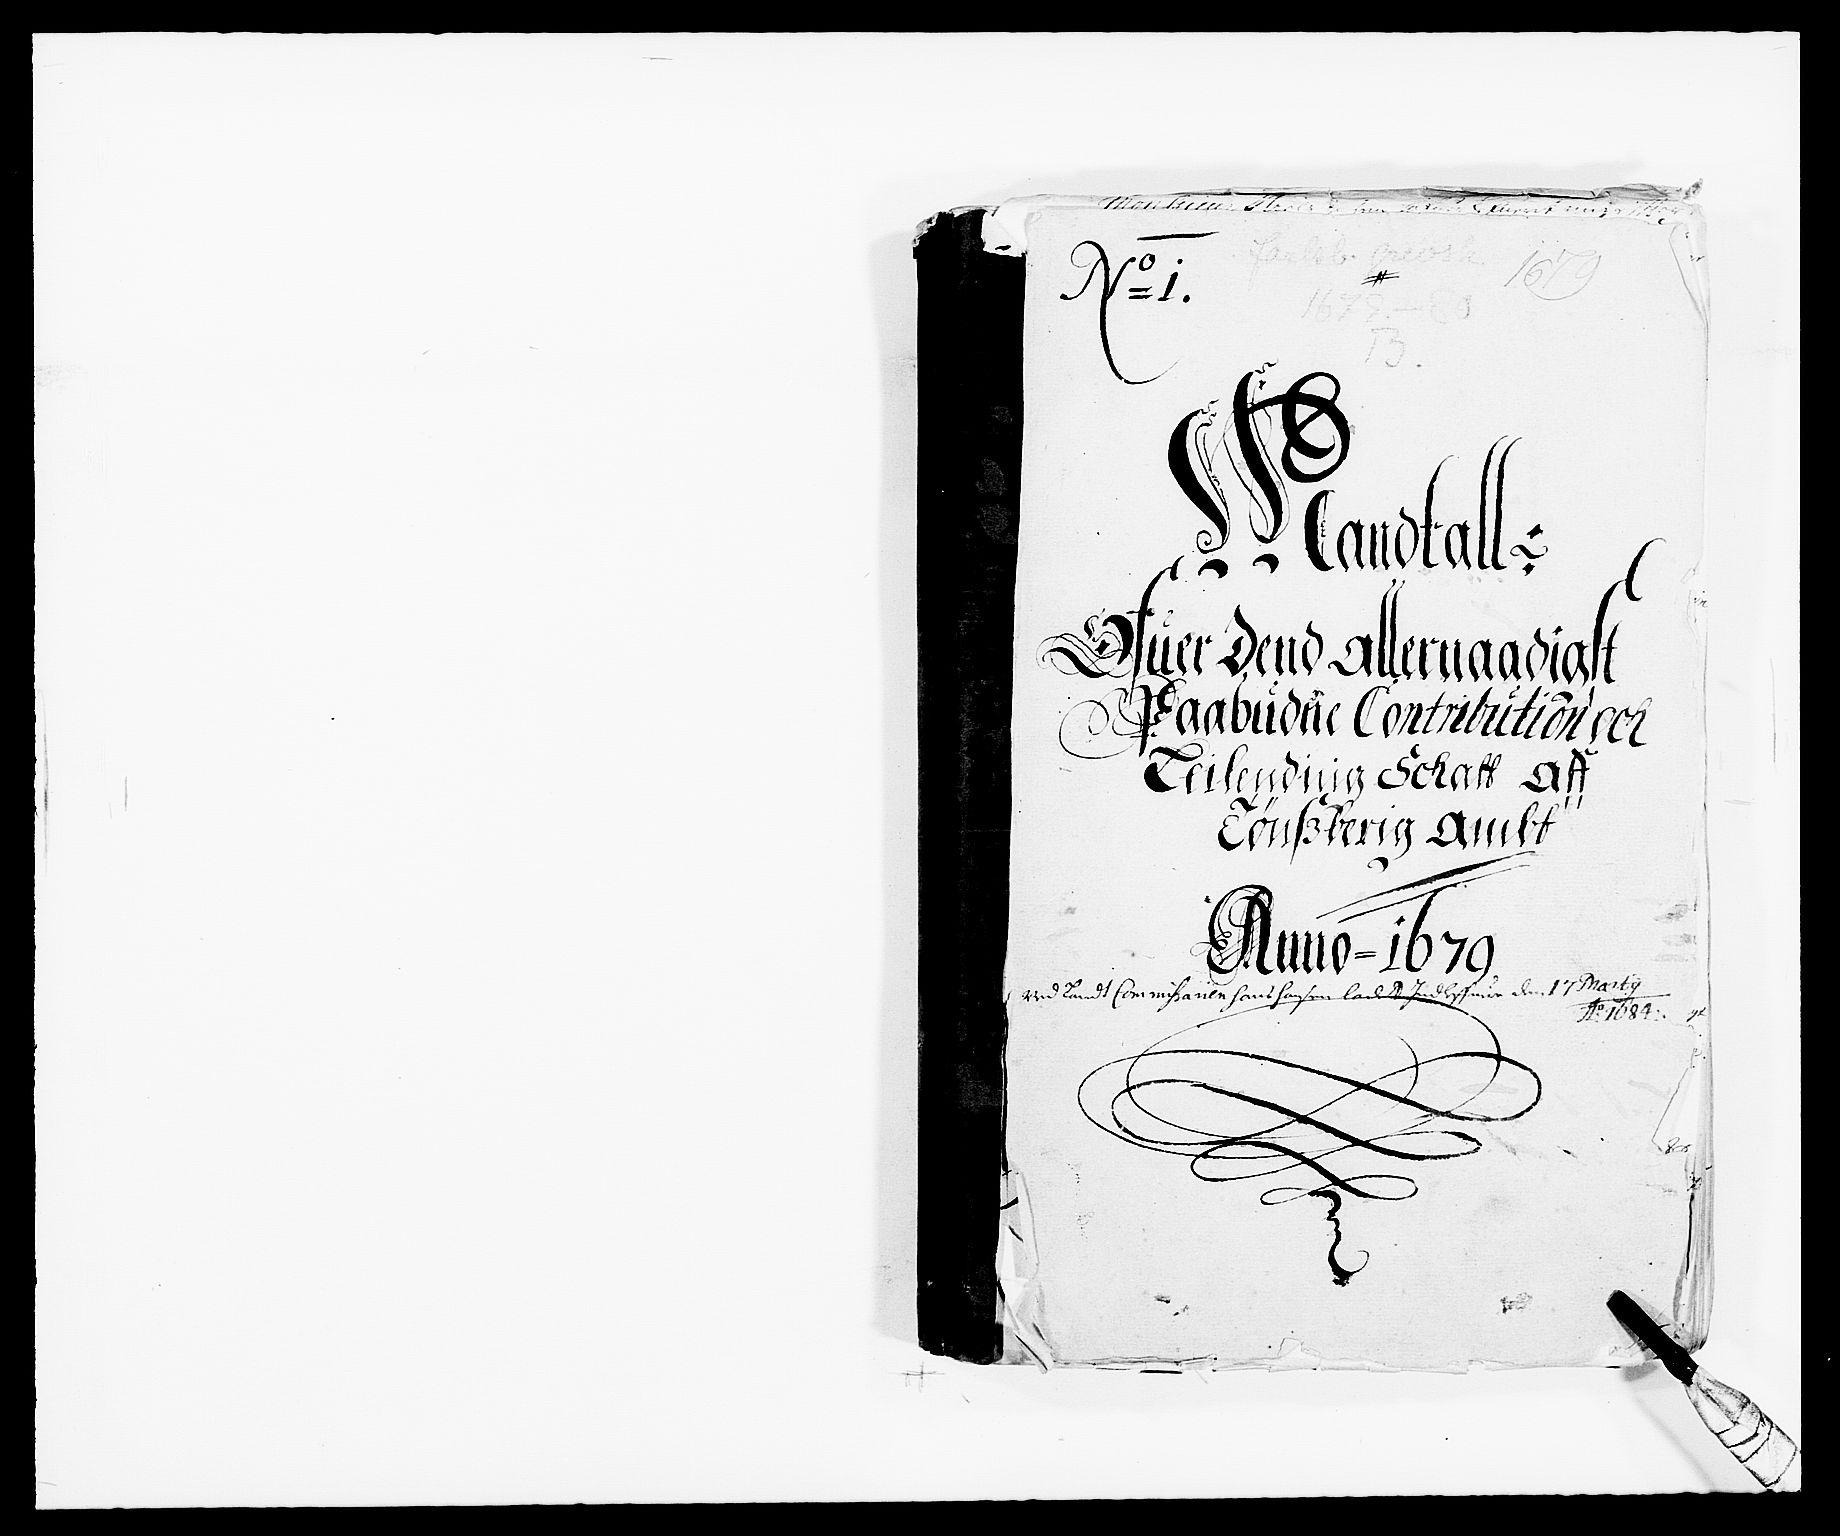 RA, Rentekammeret inntil 1814, Reviderte regnskaper, Fogderegnskap, R32/L1846: Fogderegnskap Jarlsberg grevskap, 1679-1680, s. 28